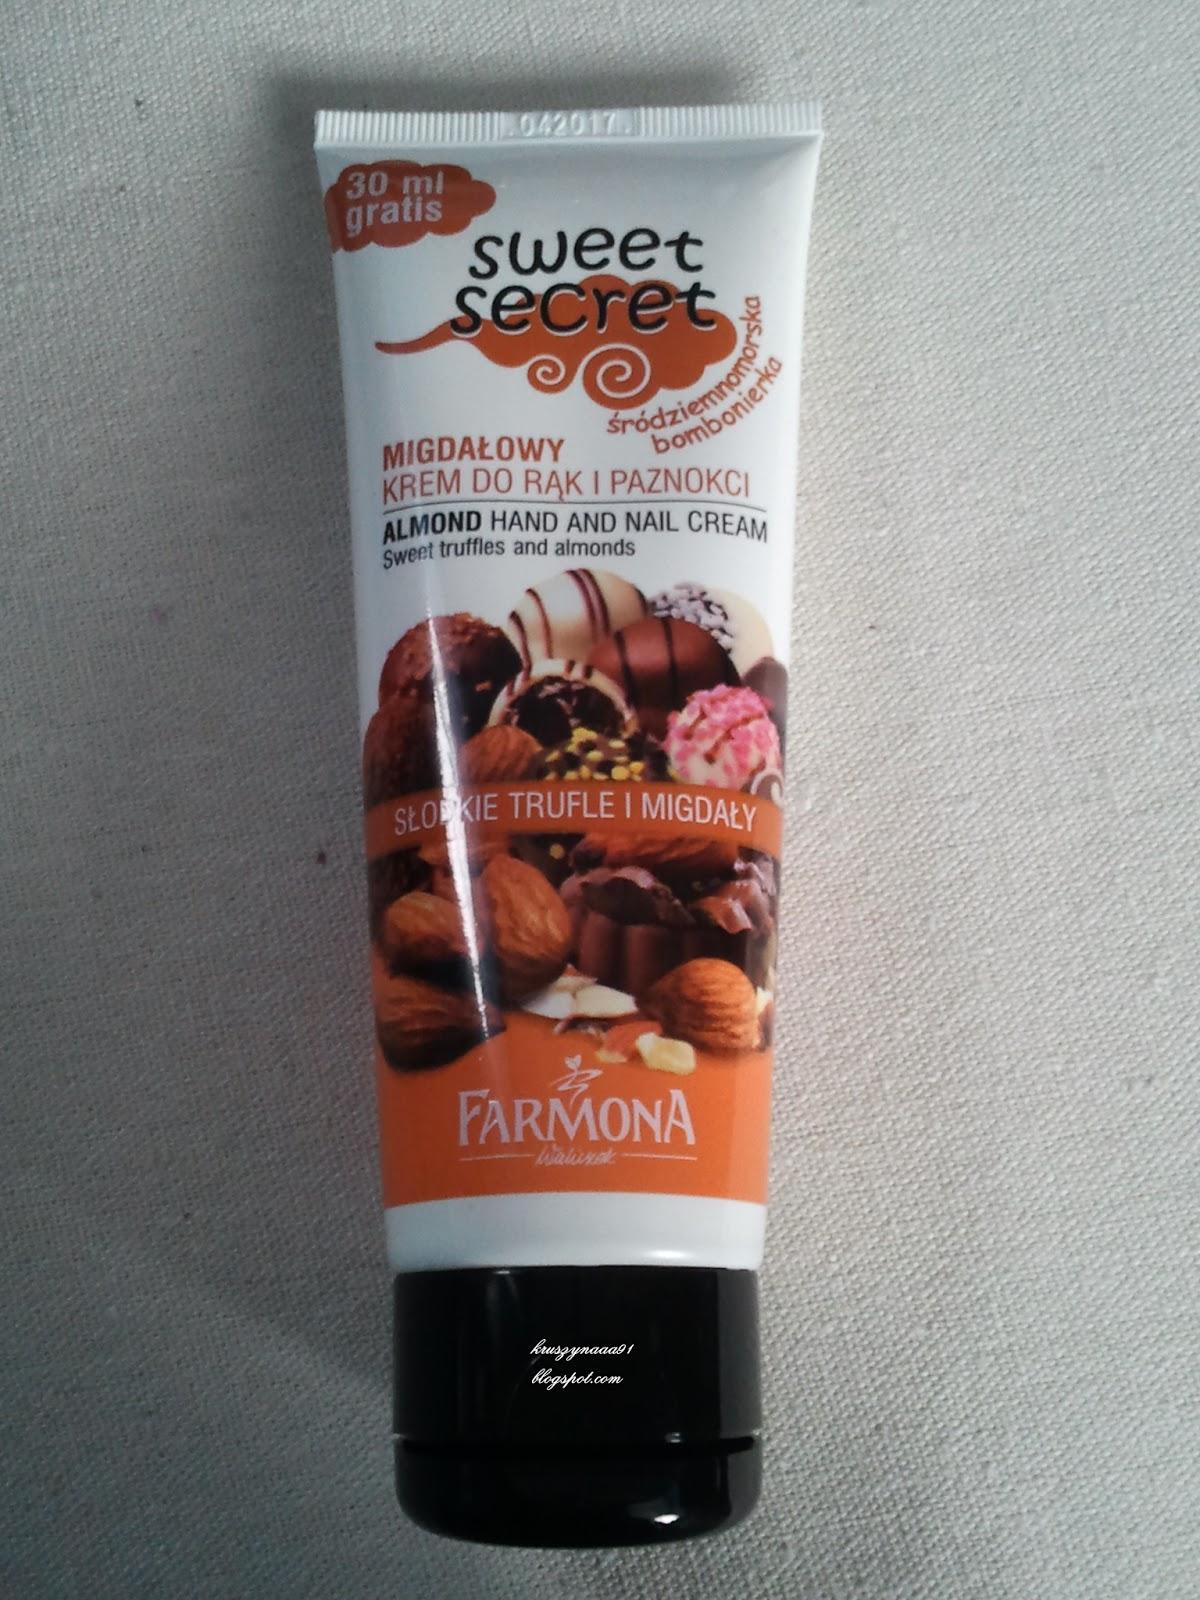 Farmona Sweet Secret śródziemnomorska bombonierka